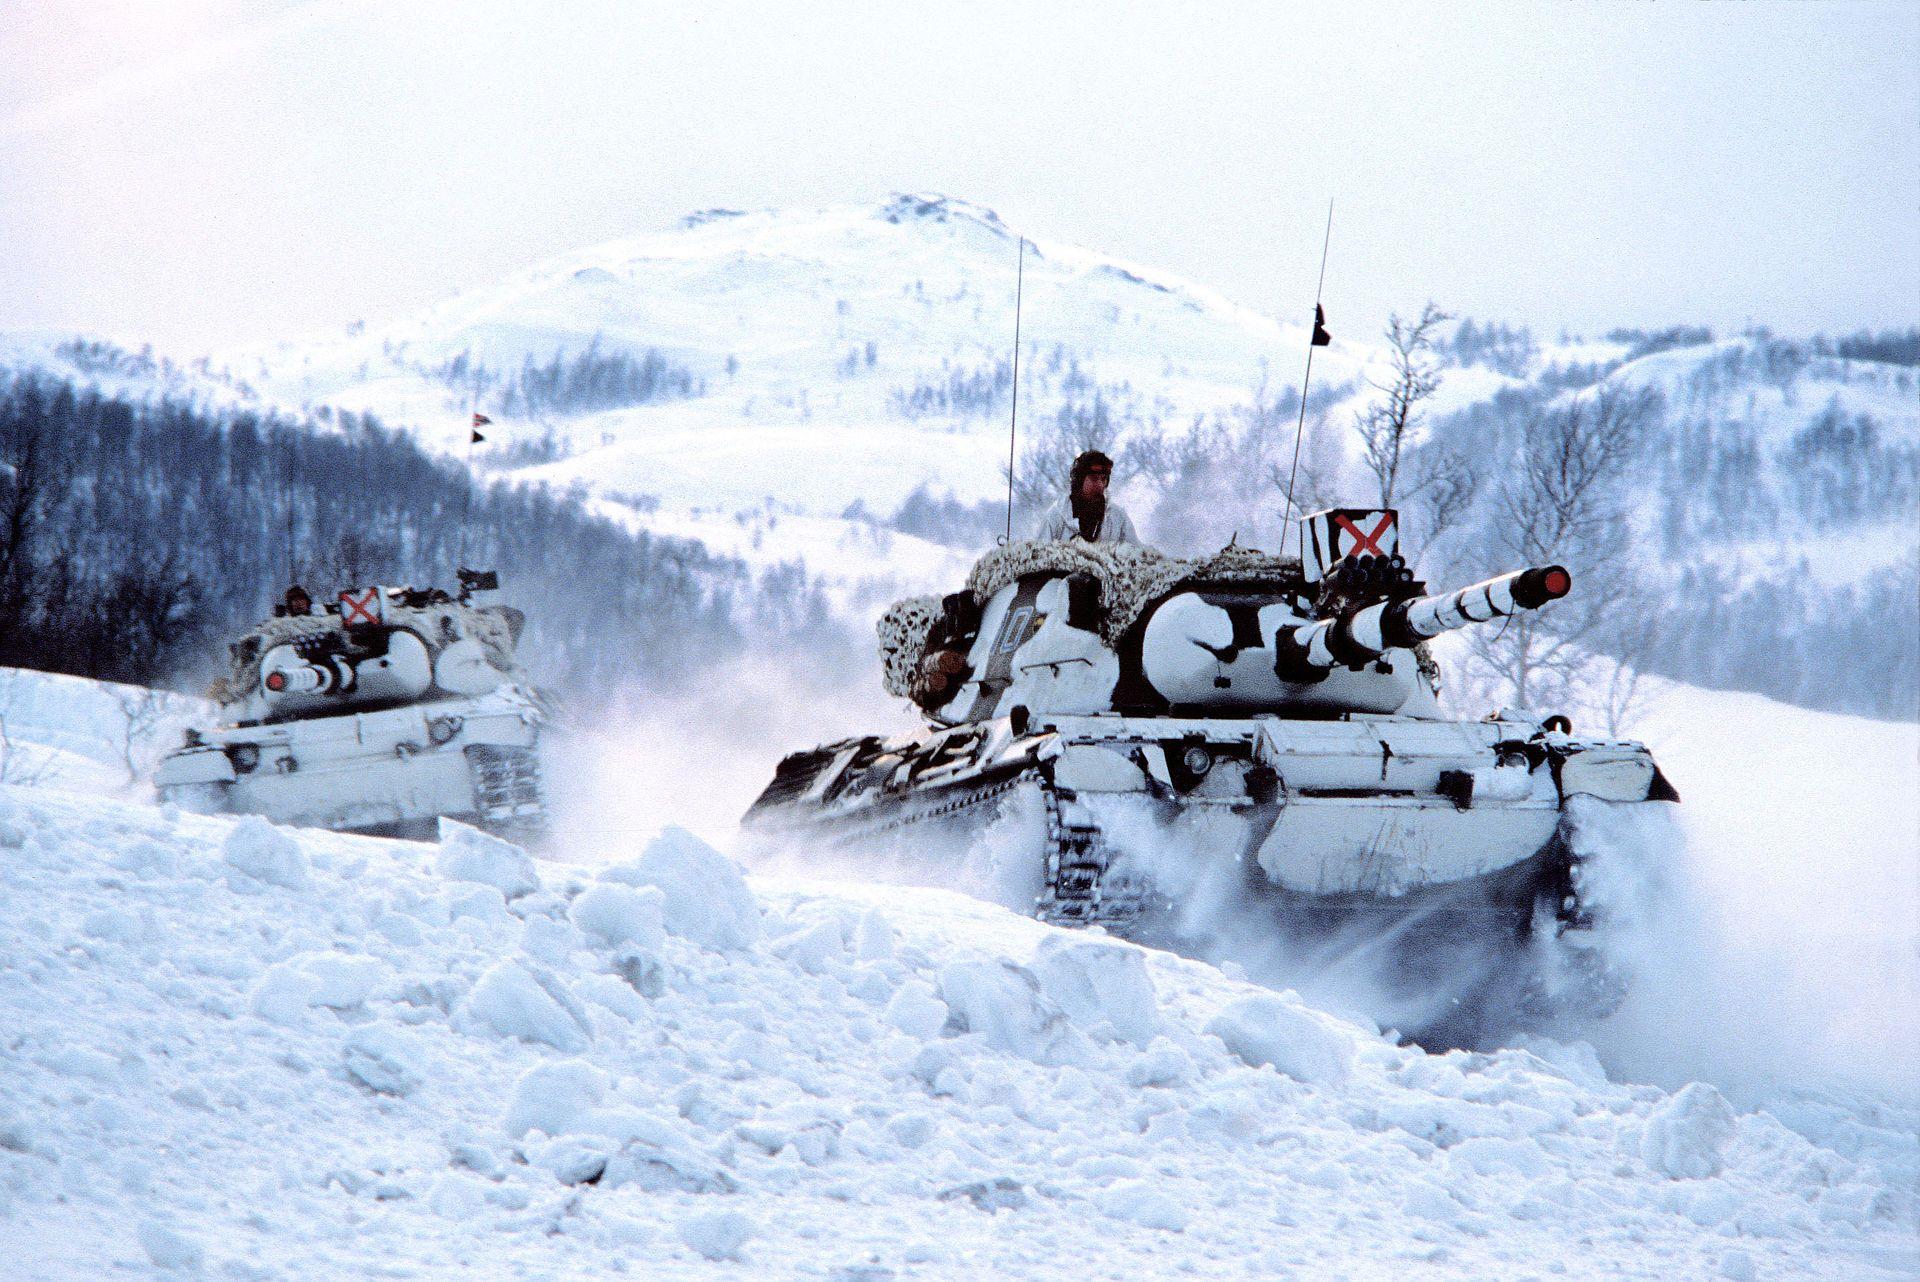 2_norwegian_Leopard_tanks_in_the_snow-compressor.jpg